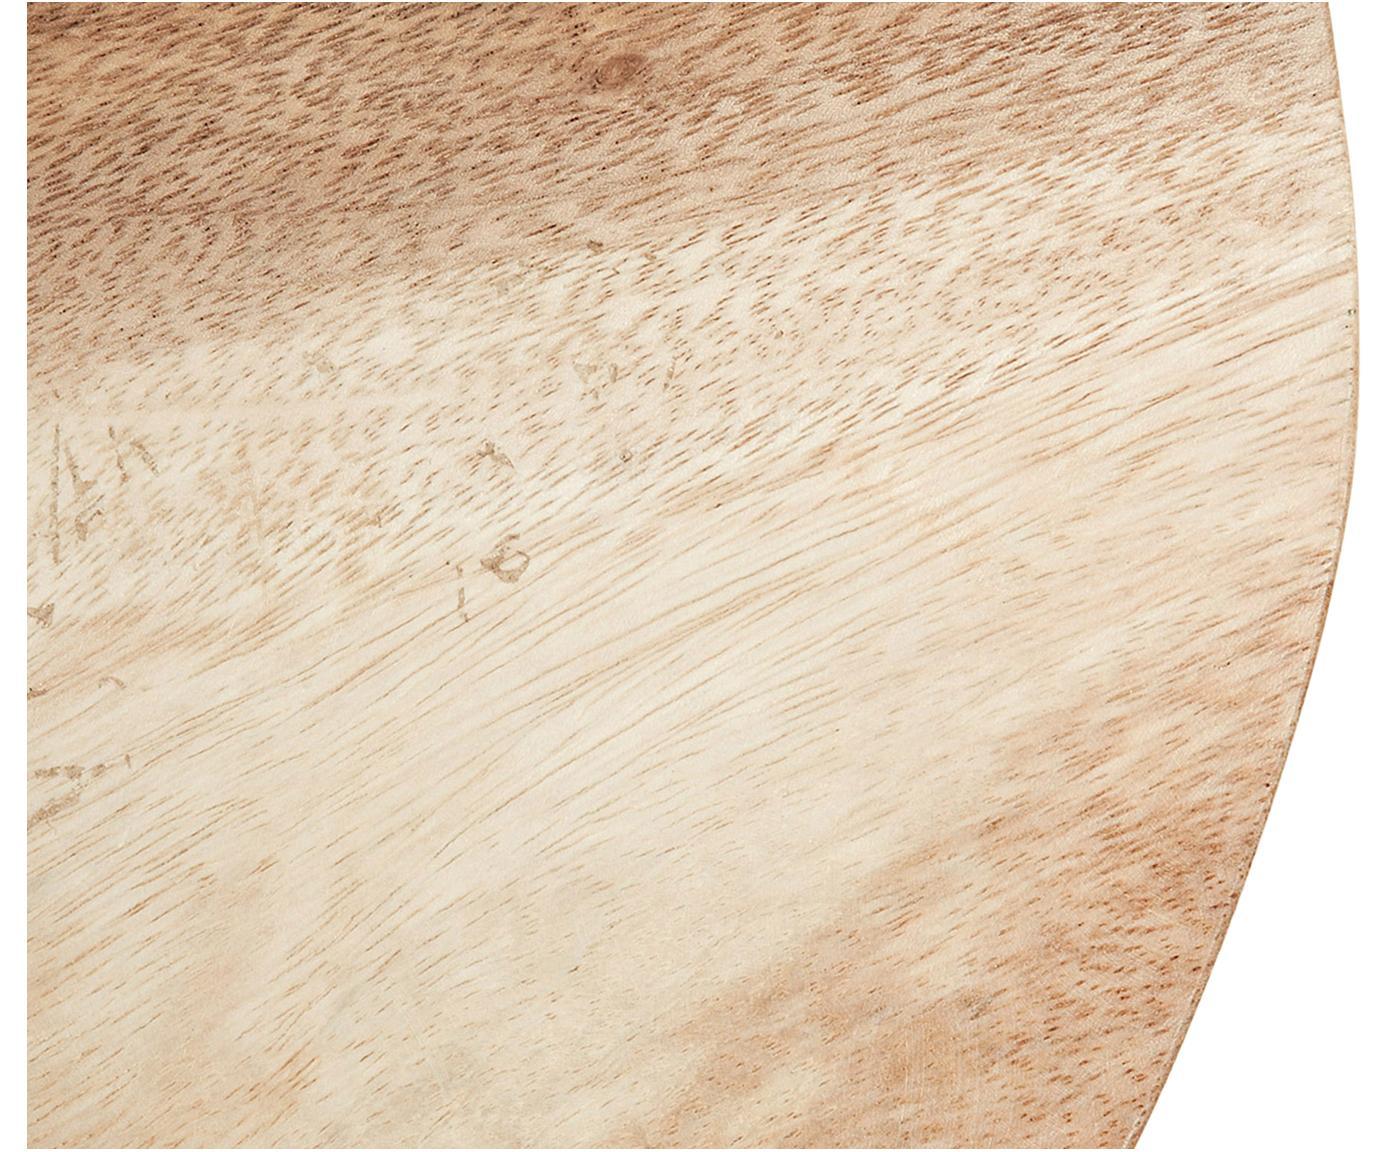 Skandi Hocker Brocsy aus Holz, Mungurholz, lackiert, Mungurholz, Weiß, 30 x 44 cm